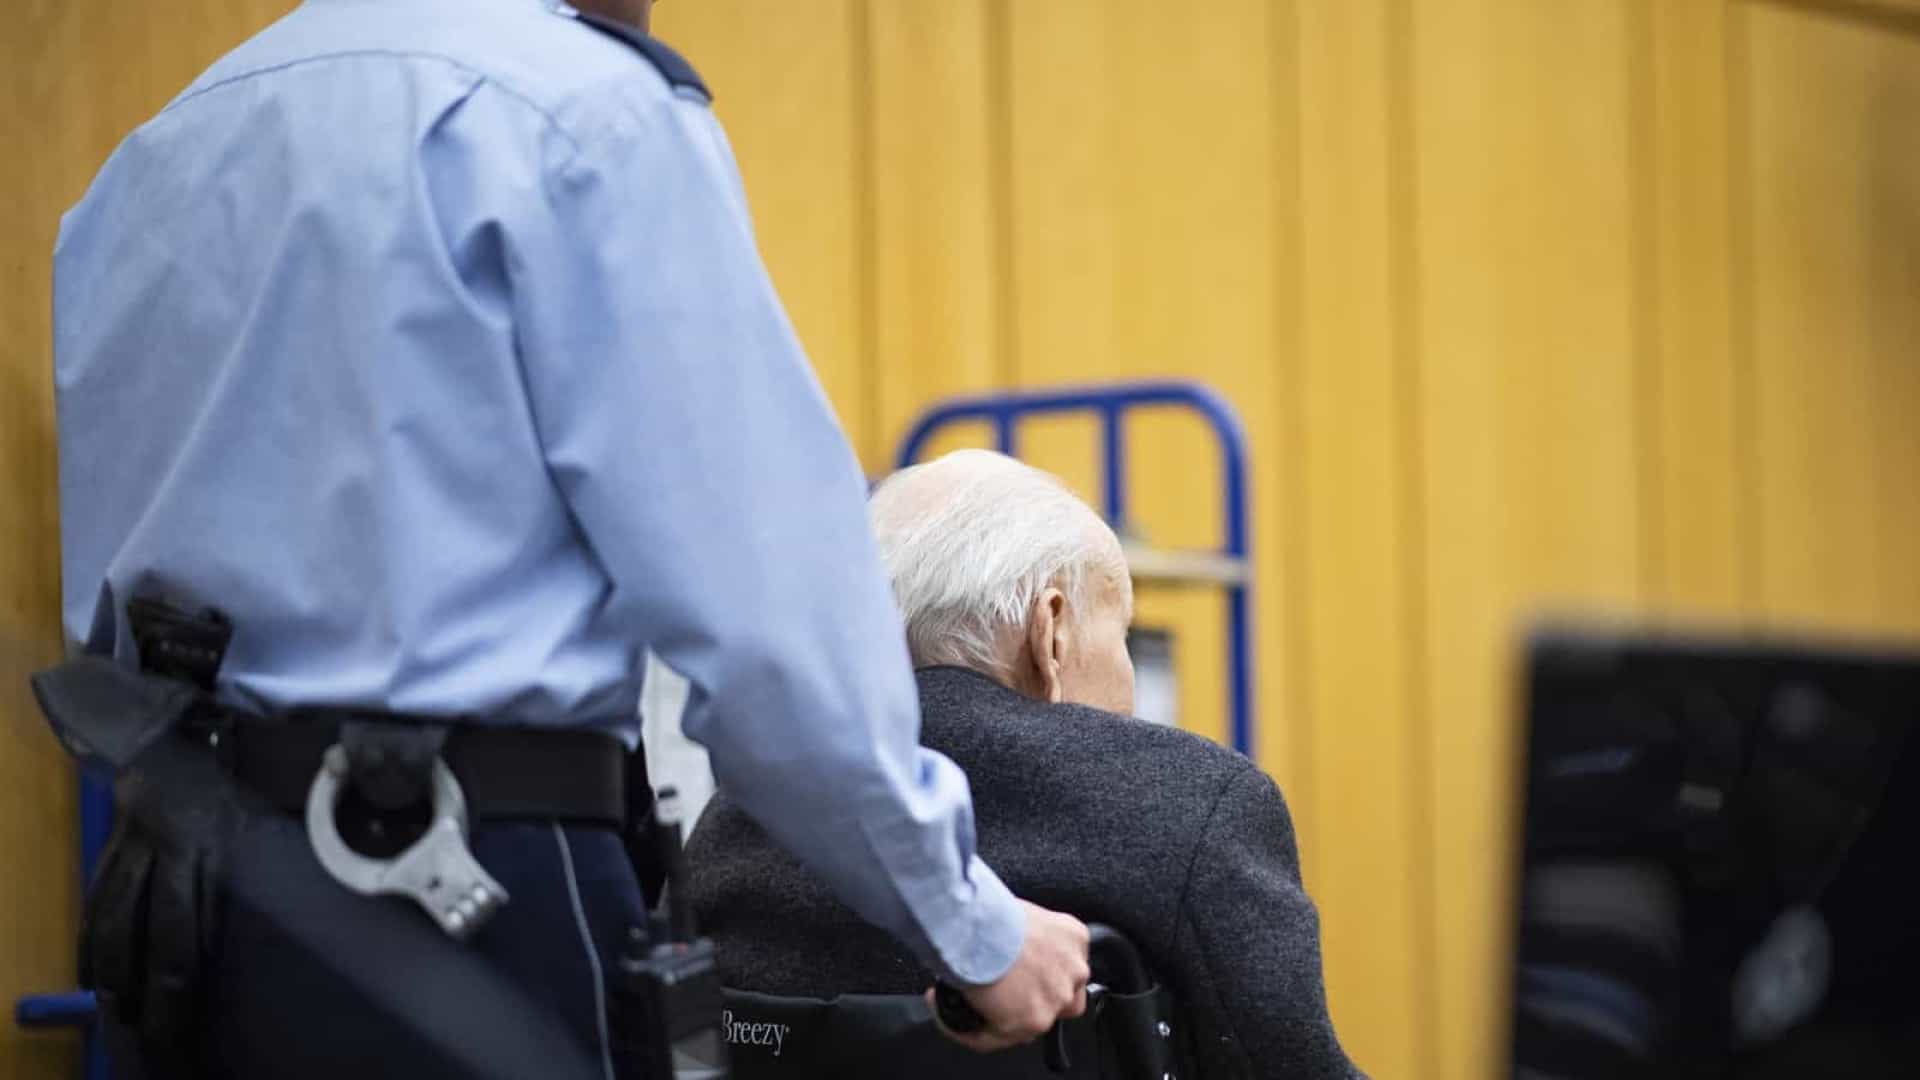 Alemanha vai julgar ex-guarda nazista por 5.230 mortes